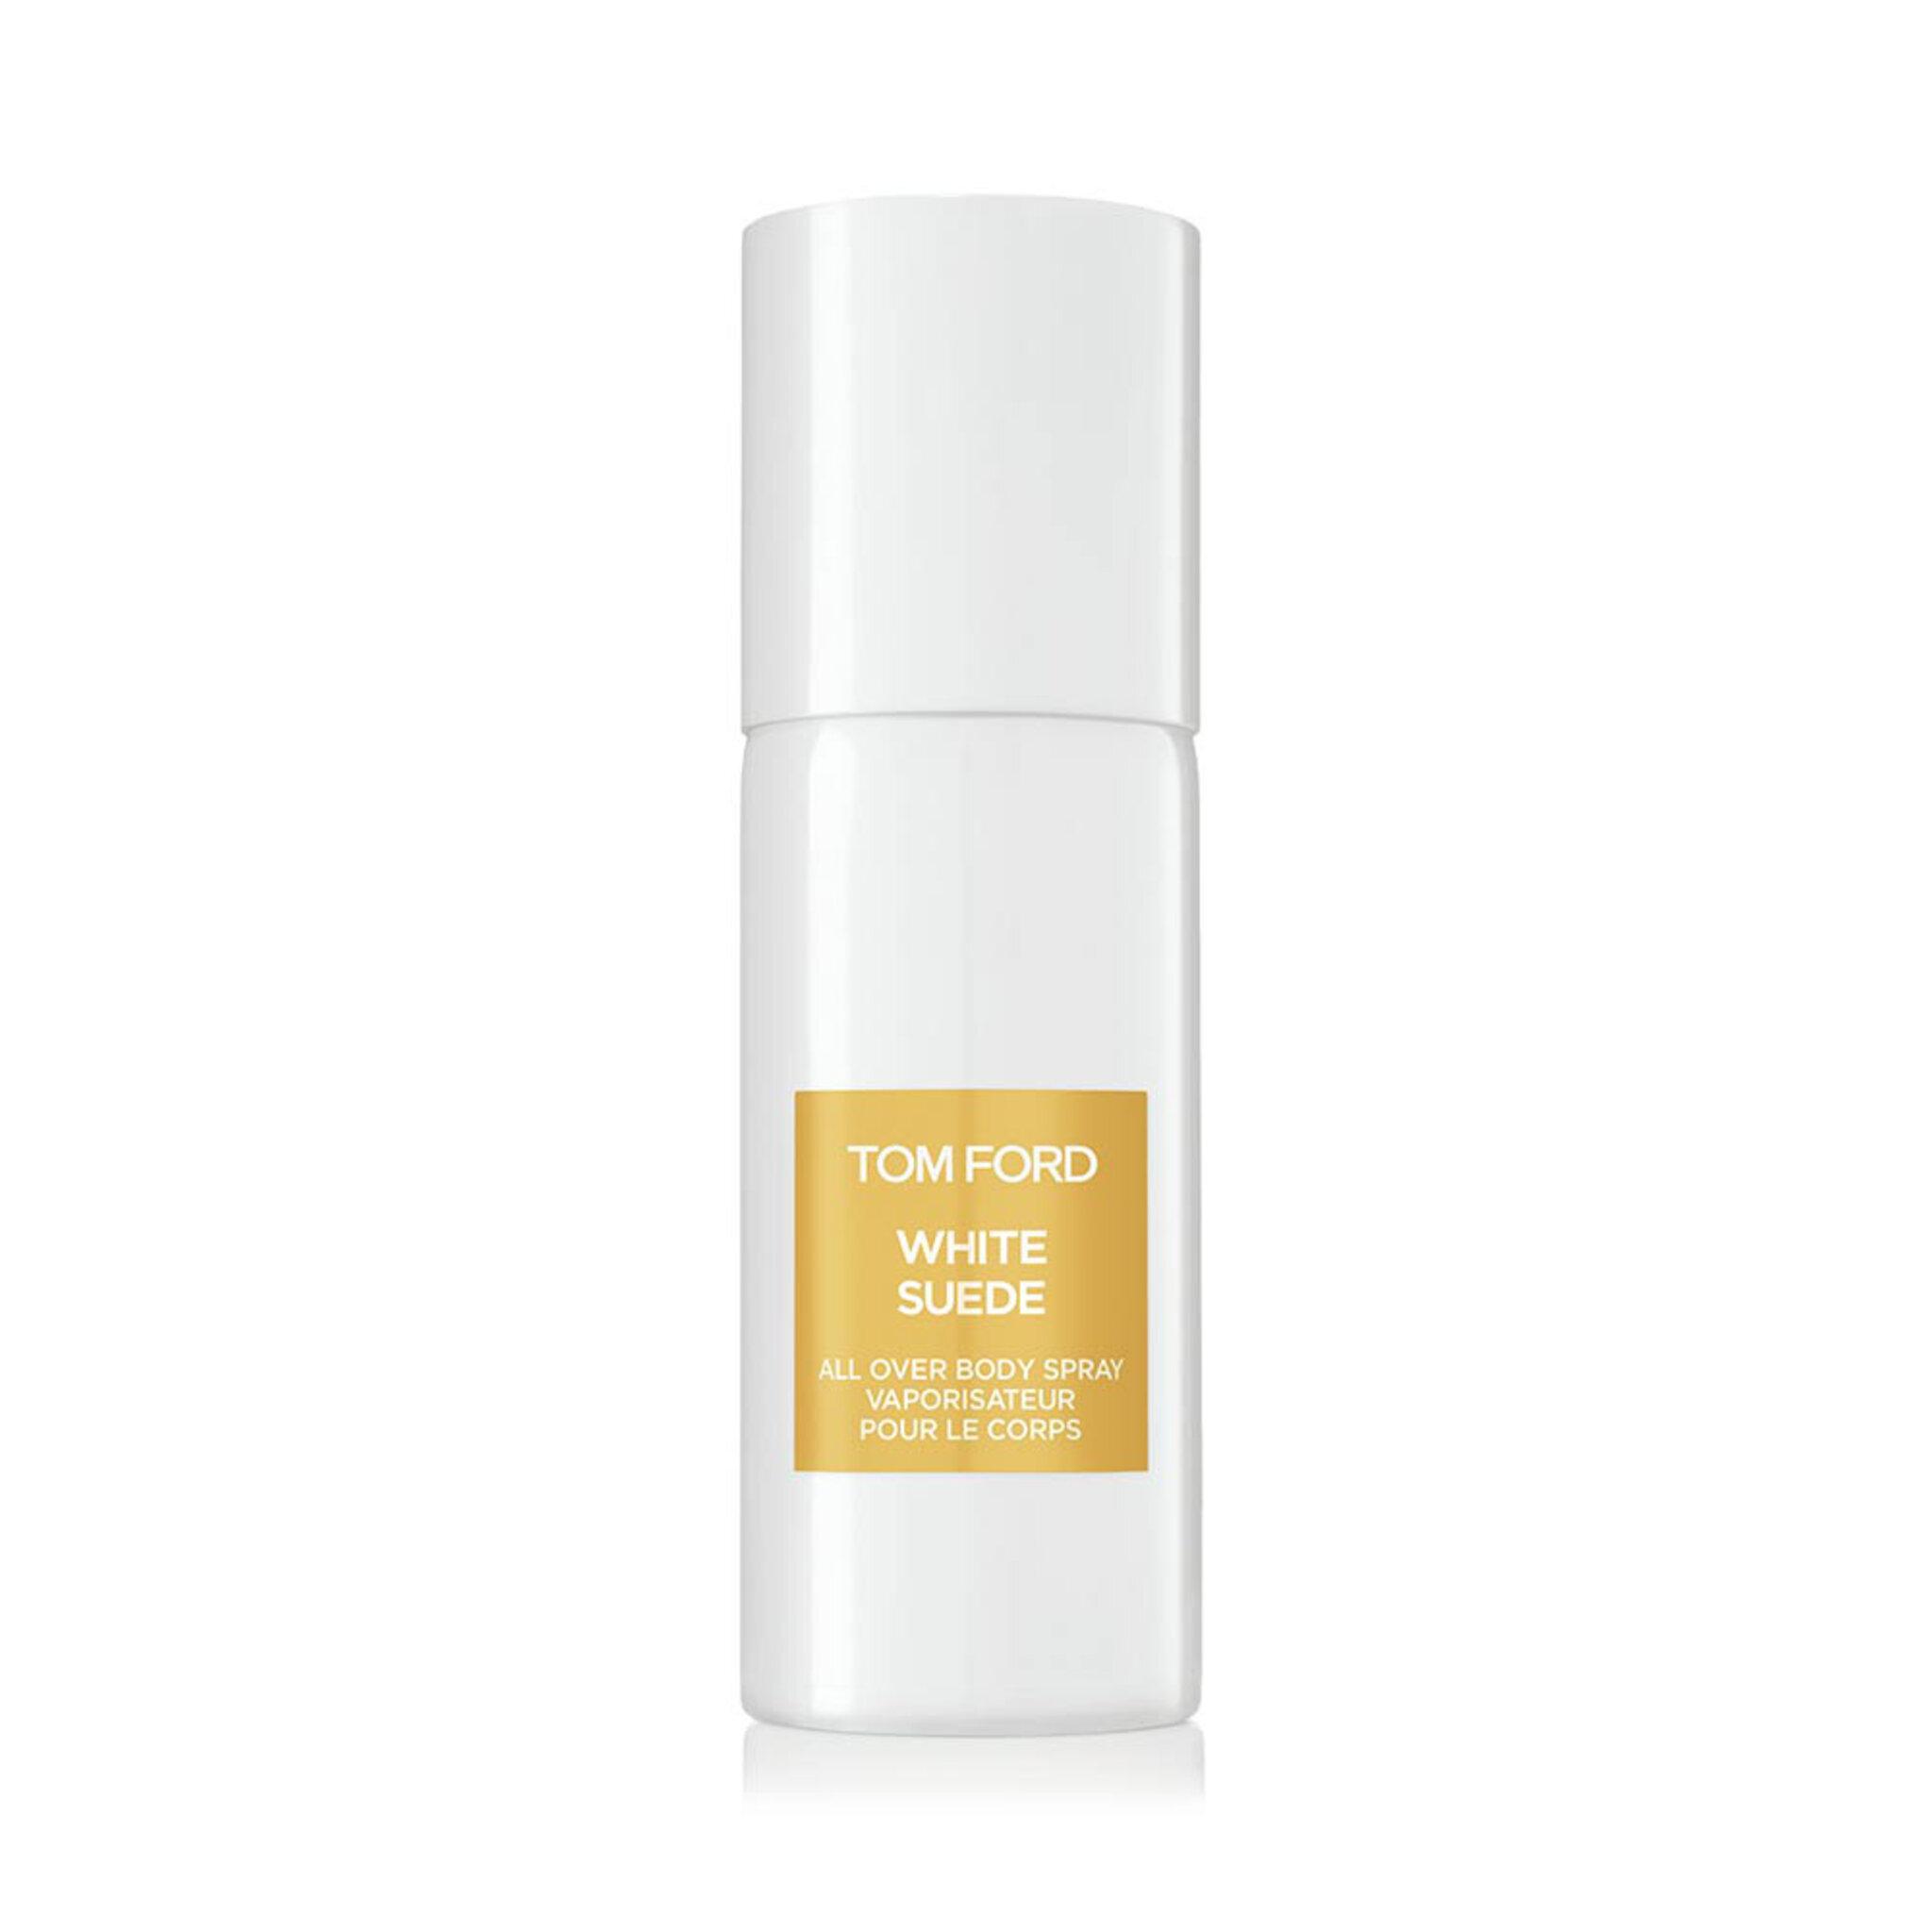 White Suede All Over Bodyspray, 150 ML